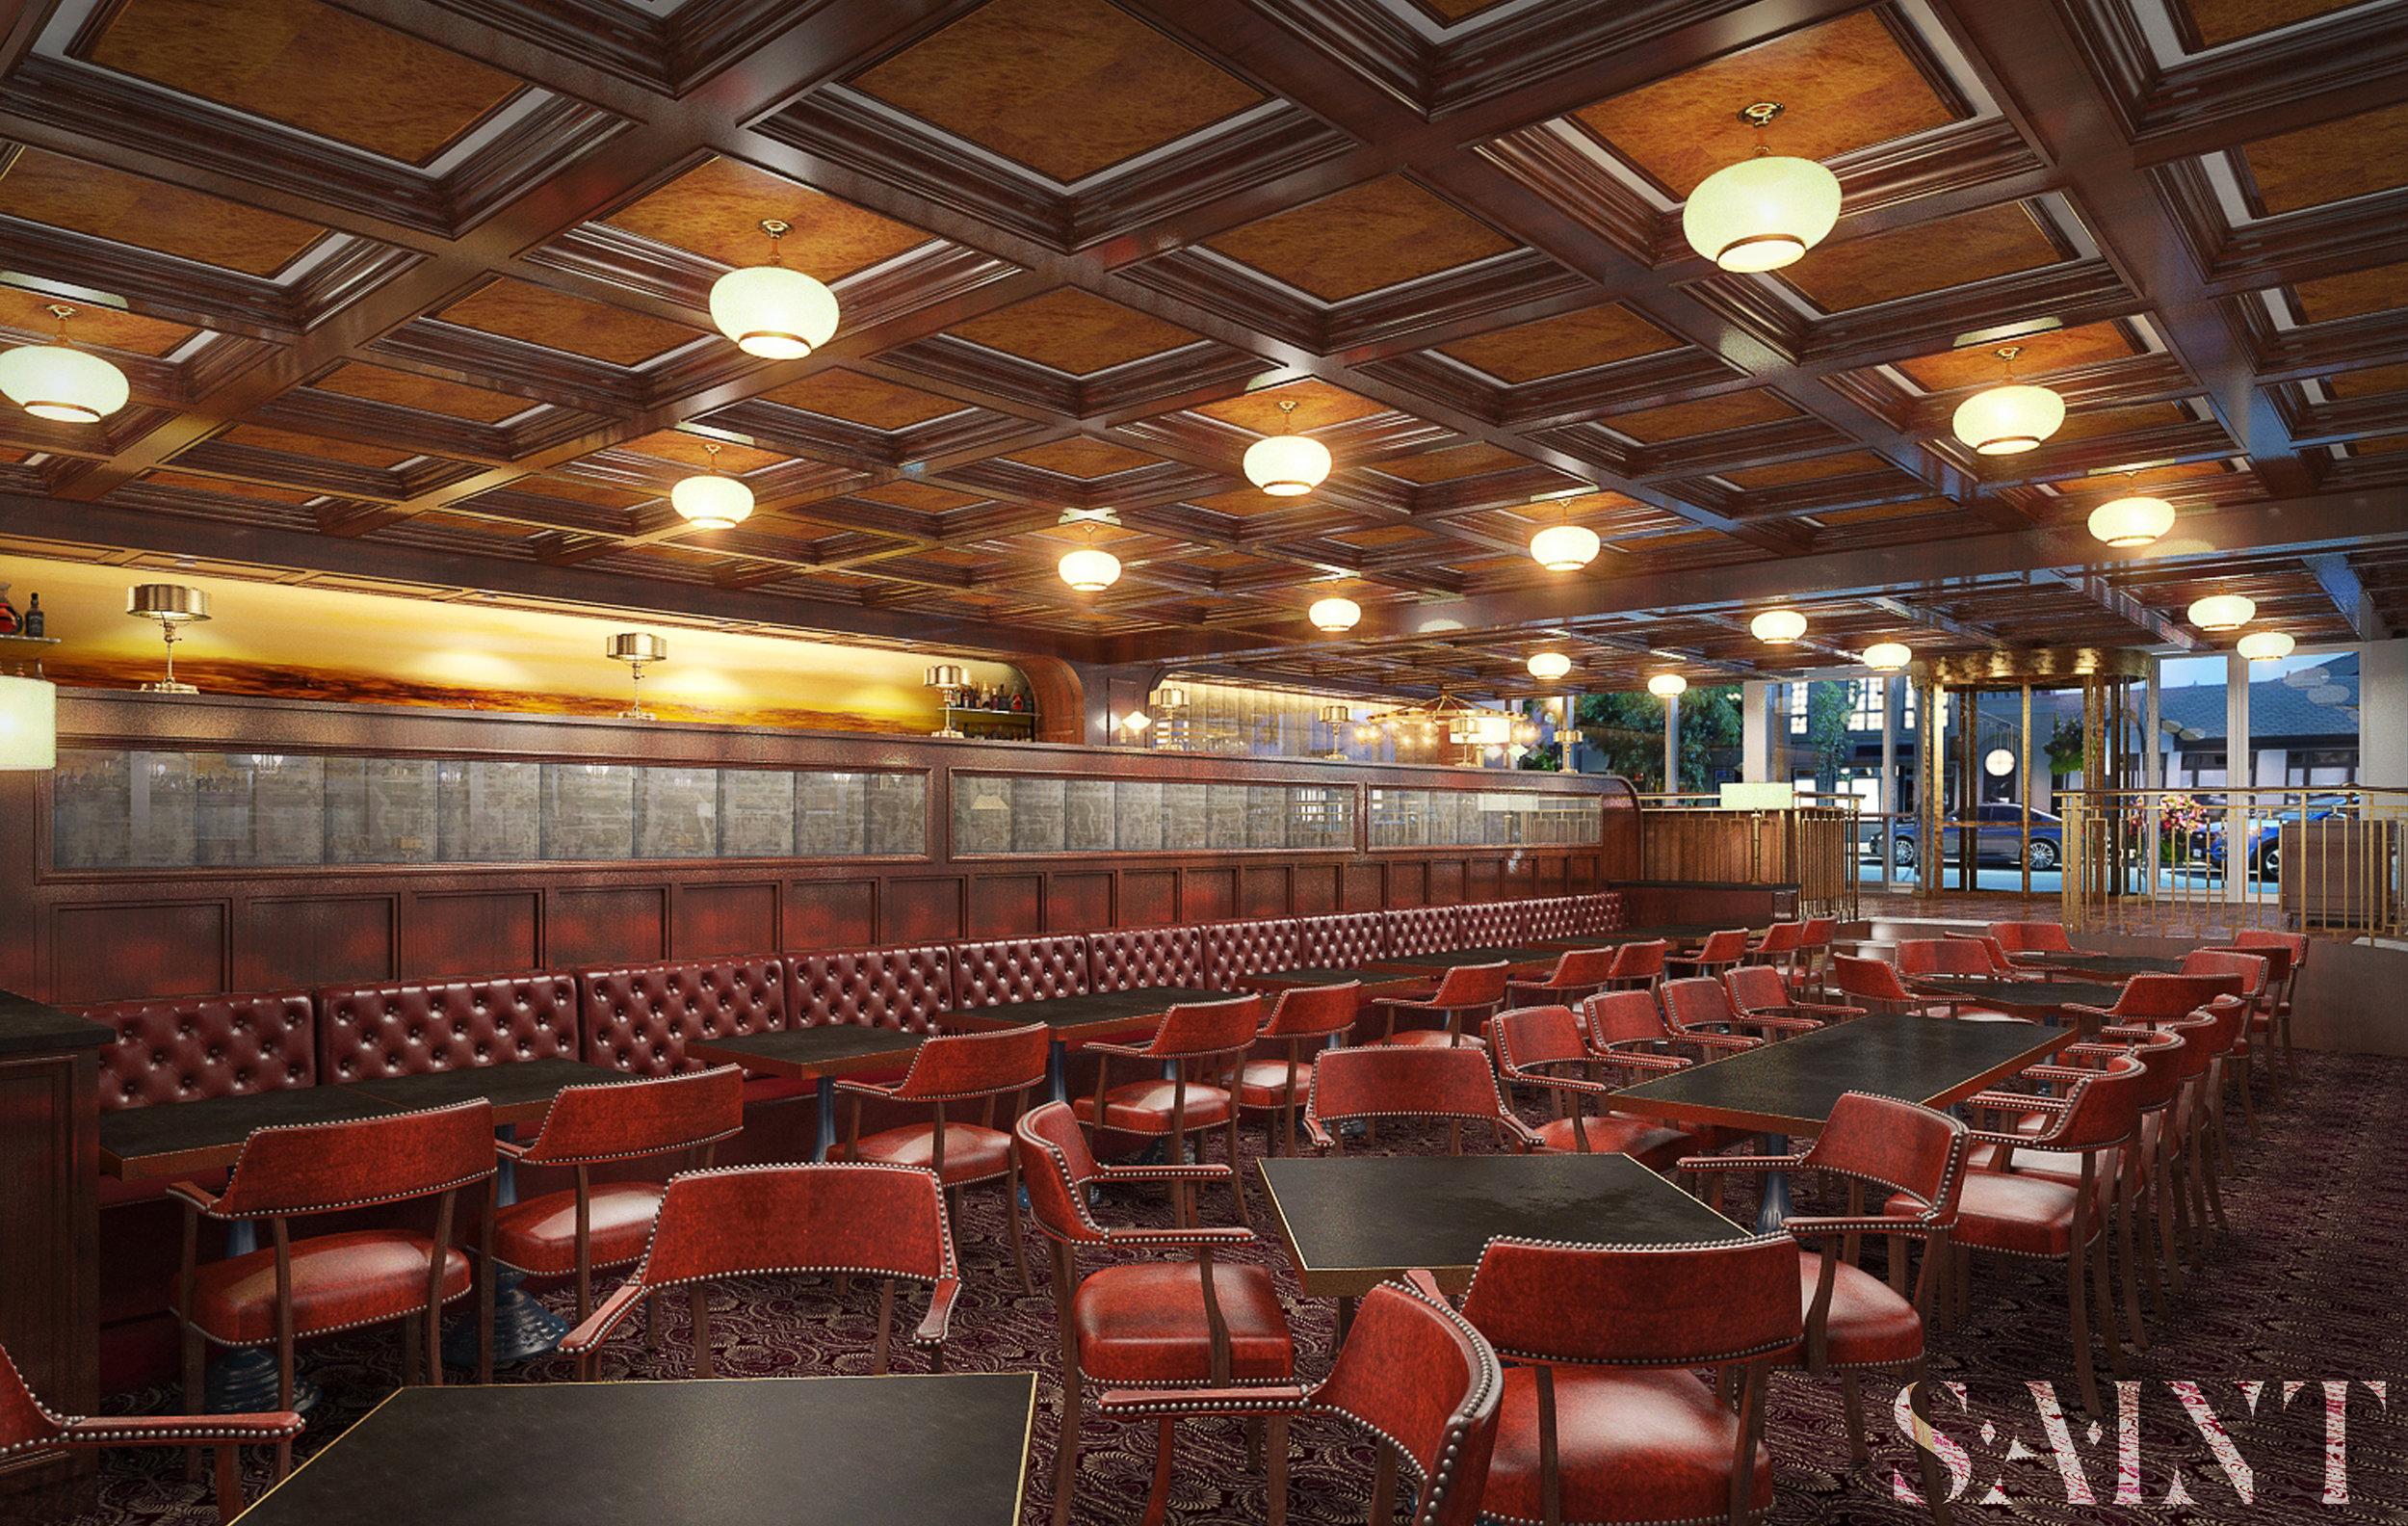 studio-saint-bars-and-restaurants-rare-steakhouse-washington-dc-rendering-4